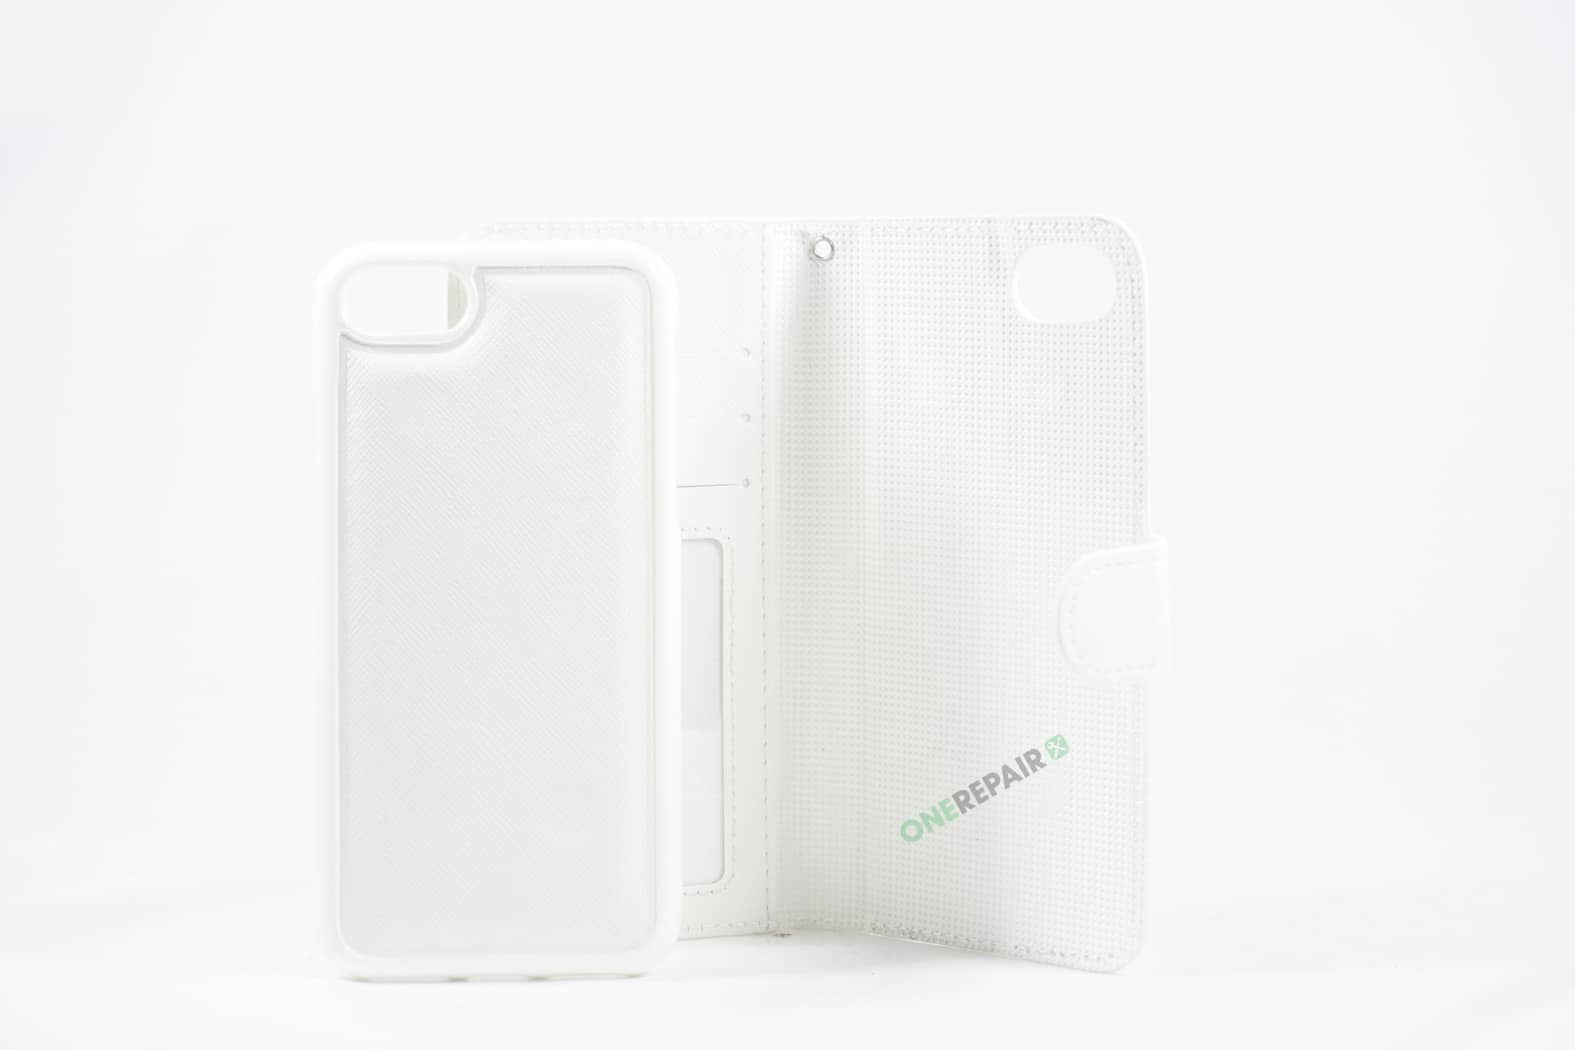 351844_iPhone_7_8_Flipcover_Magnet_Tynd_Cover_Hvid_OneRepair_WM_00003